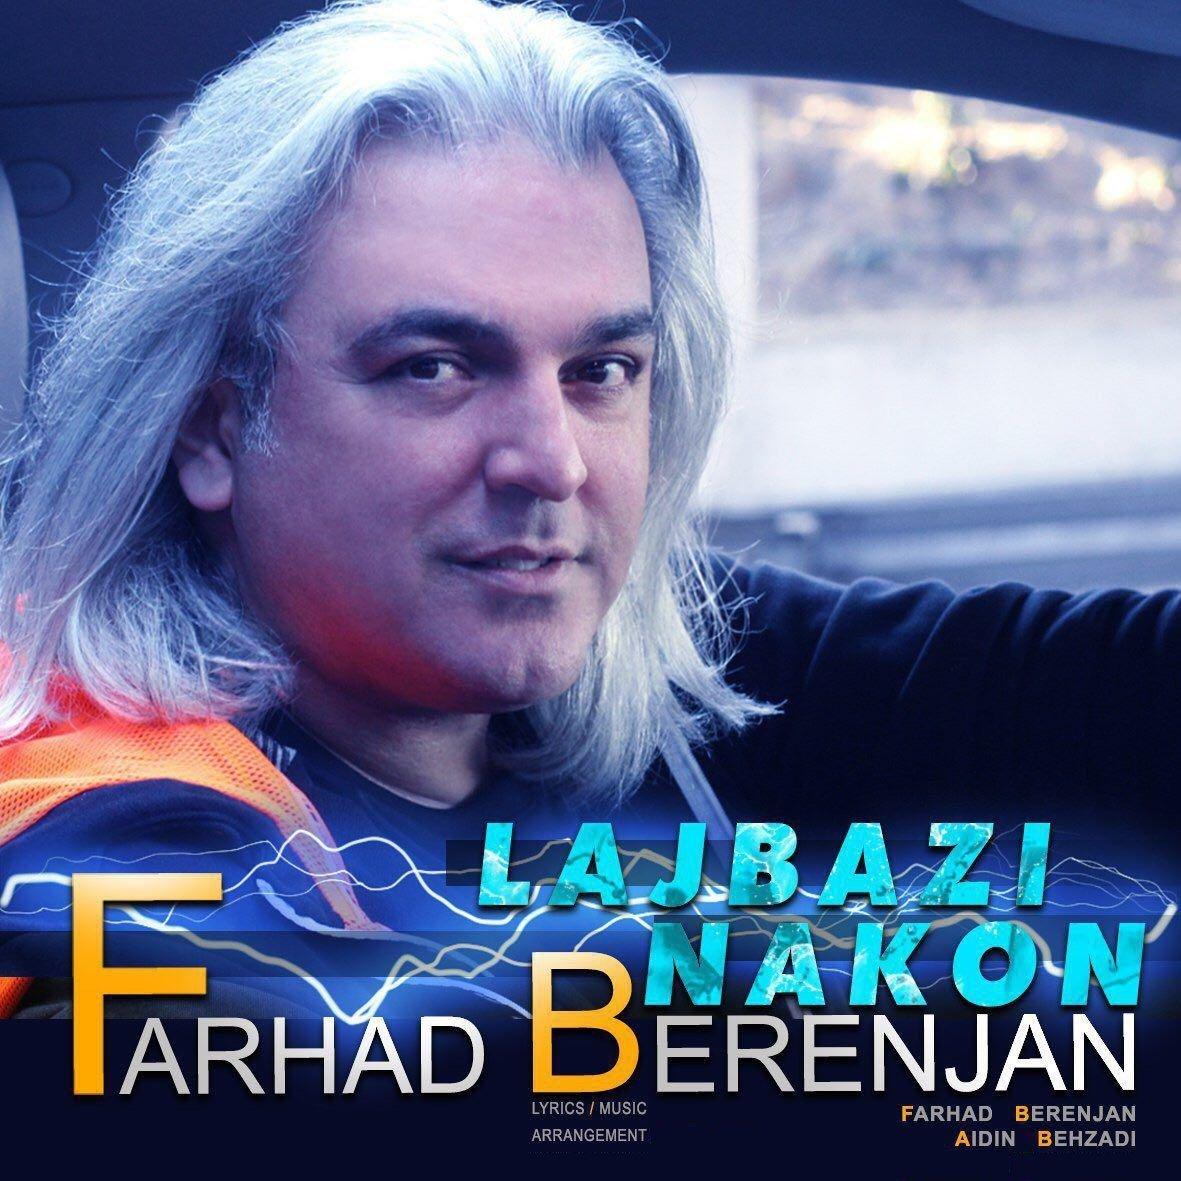 Farhad Berenjan – Lajbazi Nakon